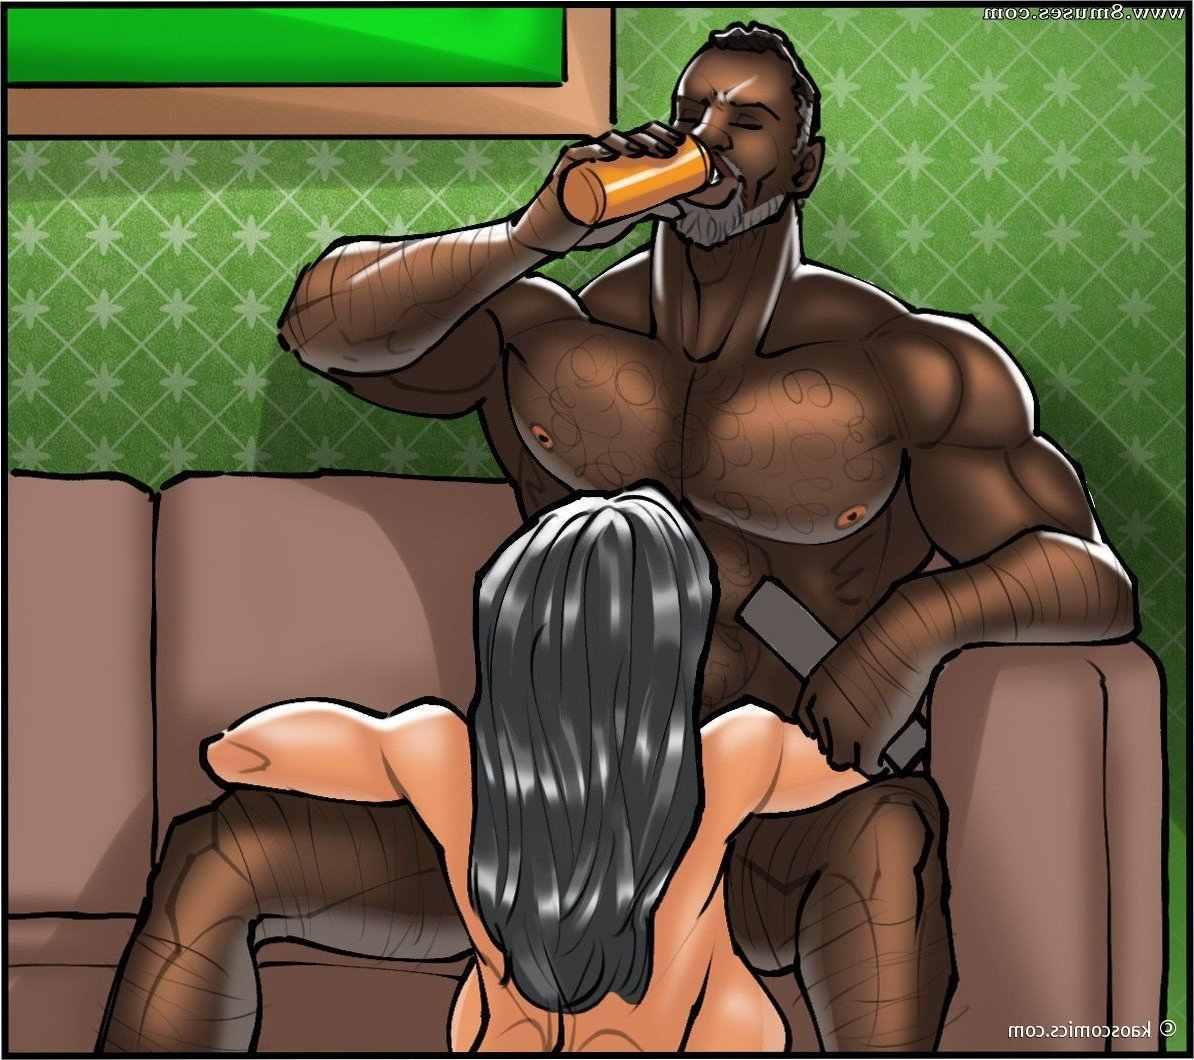 Black women white man sex cartoon comics